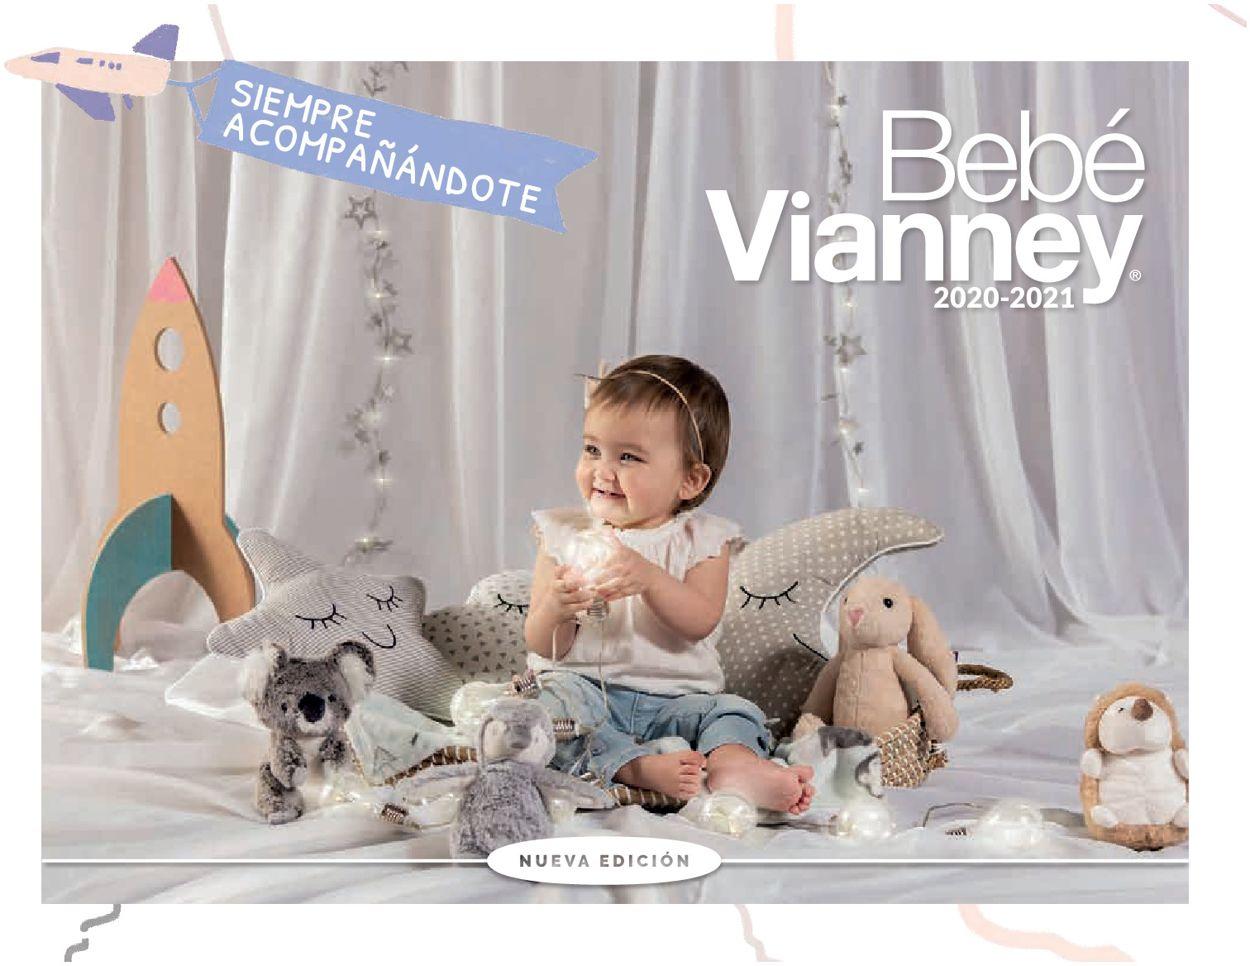 Vianney Folleto - 05.06-31.03.2021